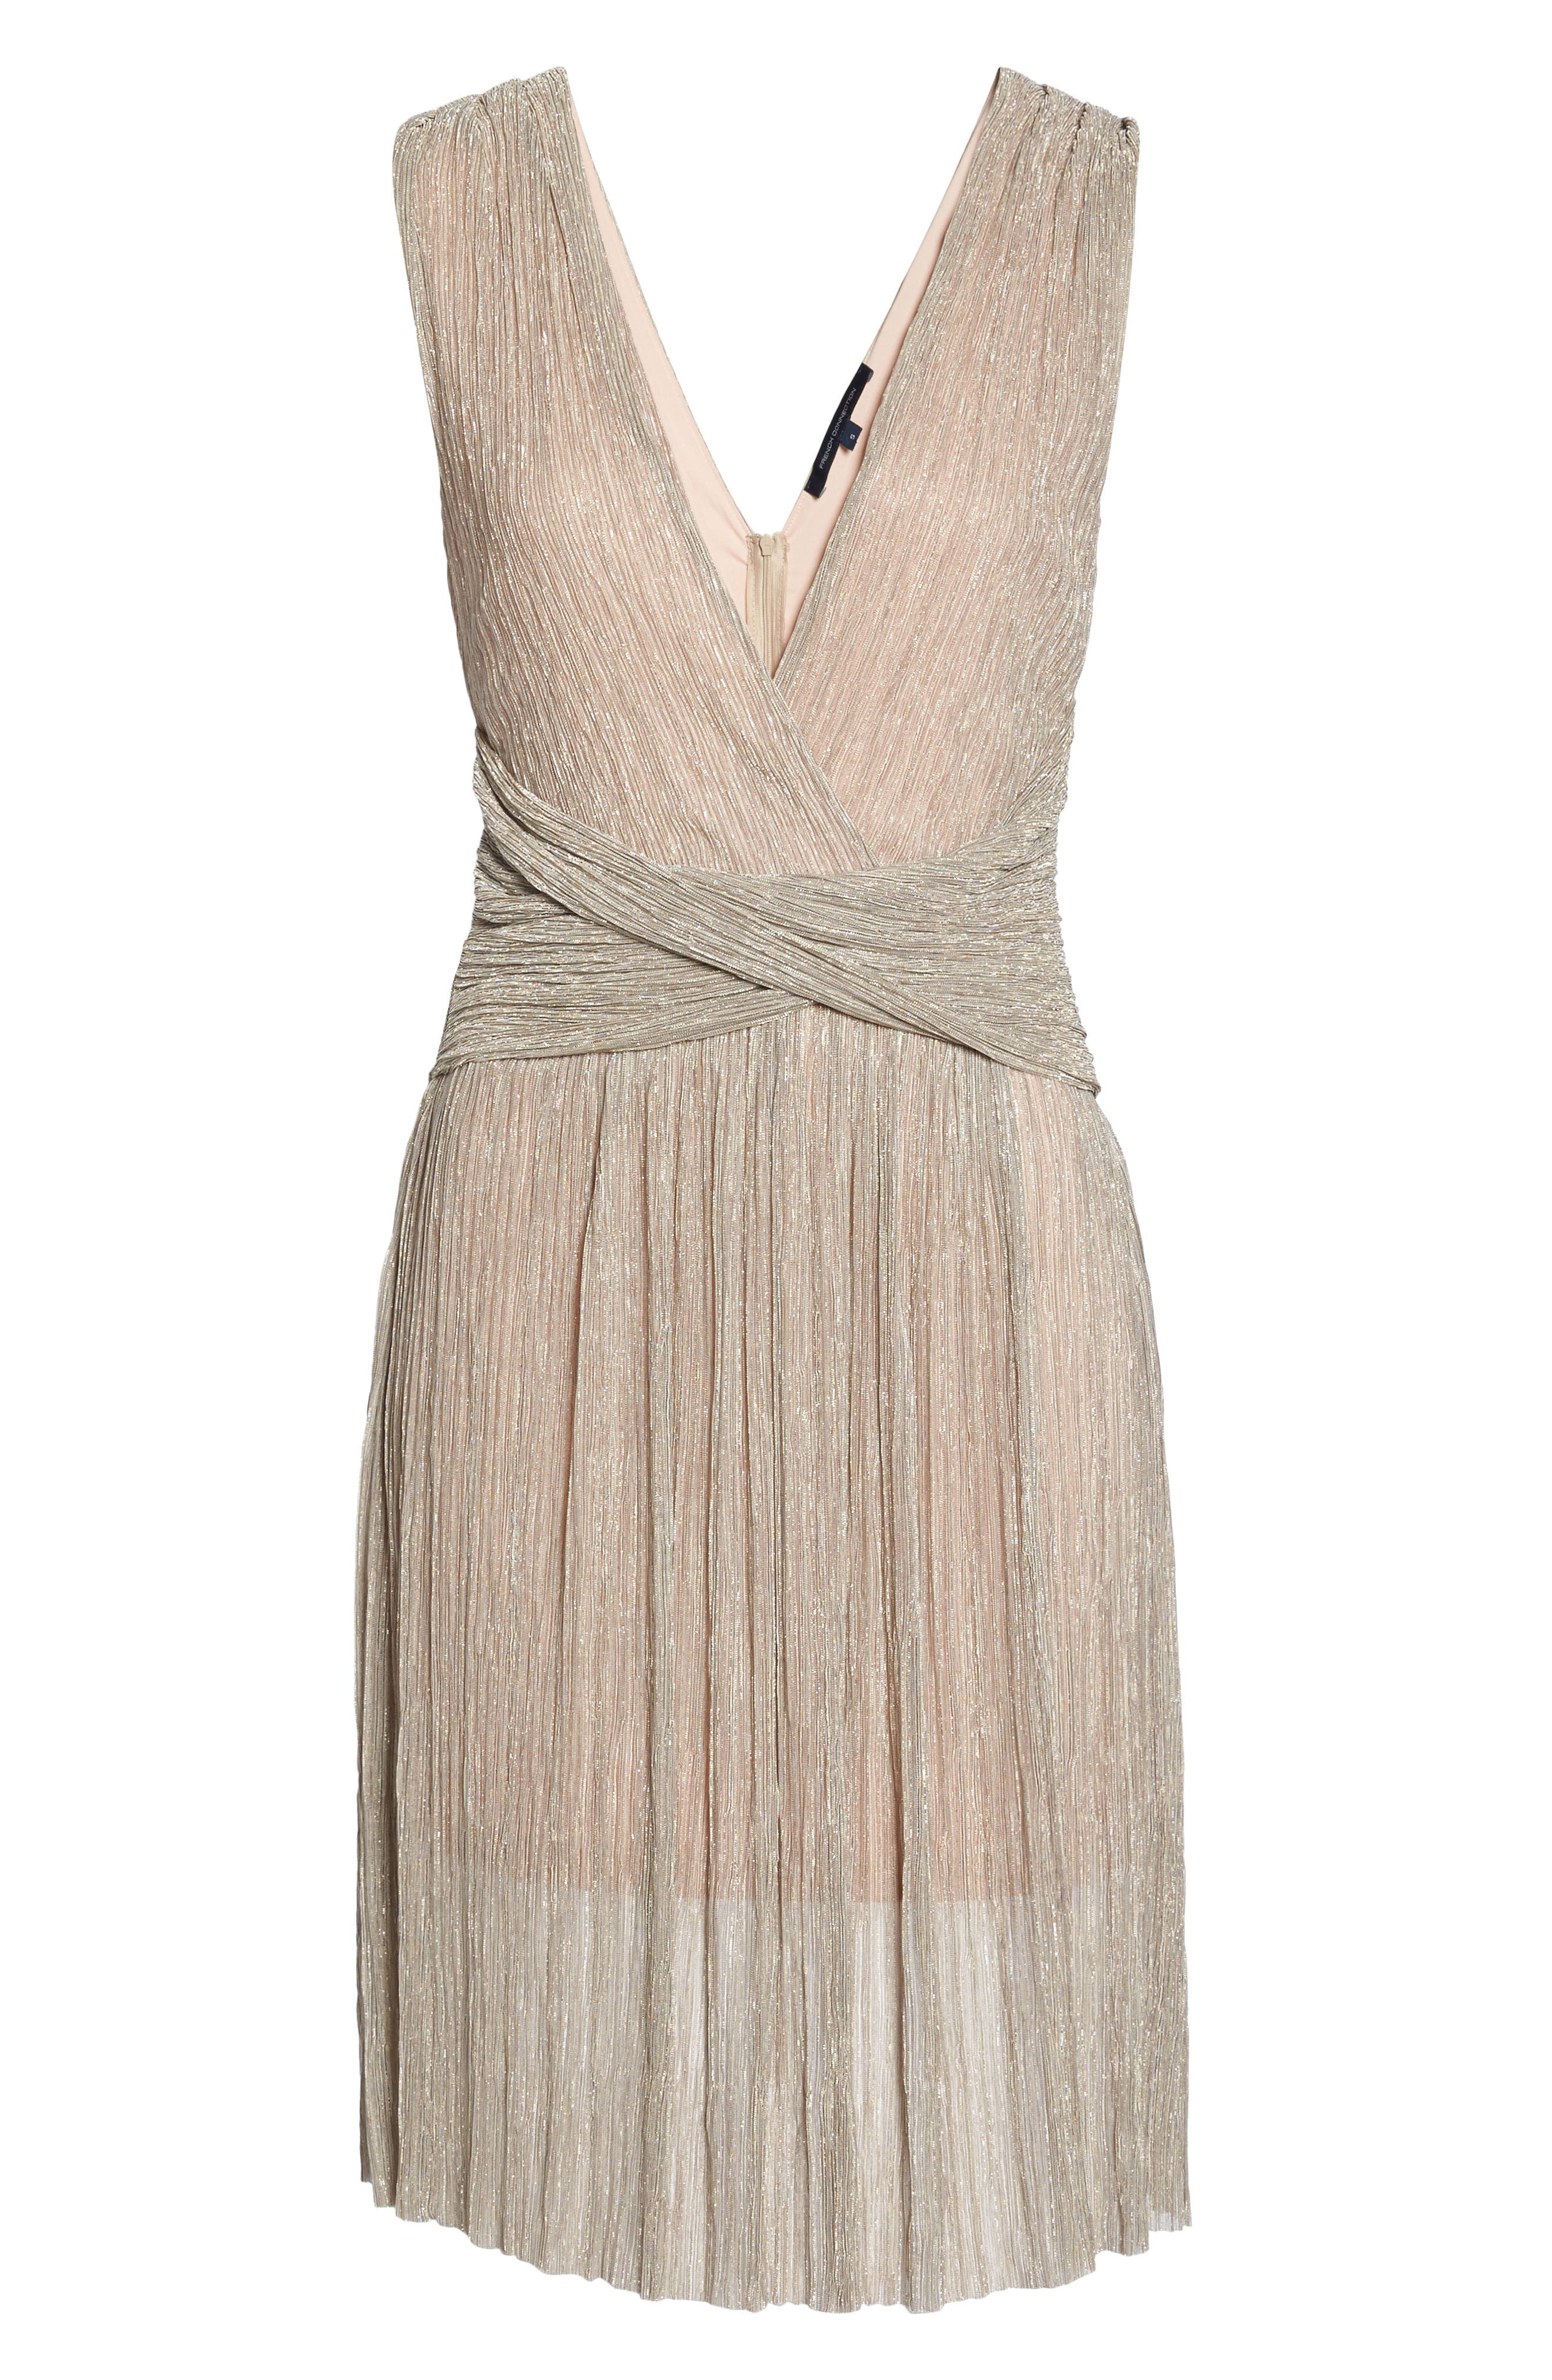 Marcelle Fit & Flare Dress,                             Alternate thumbnail 12, color,